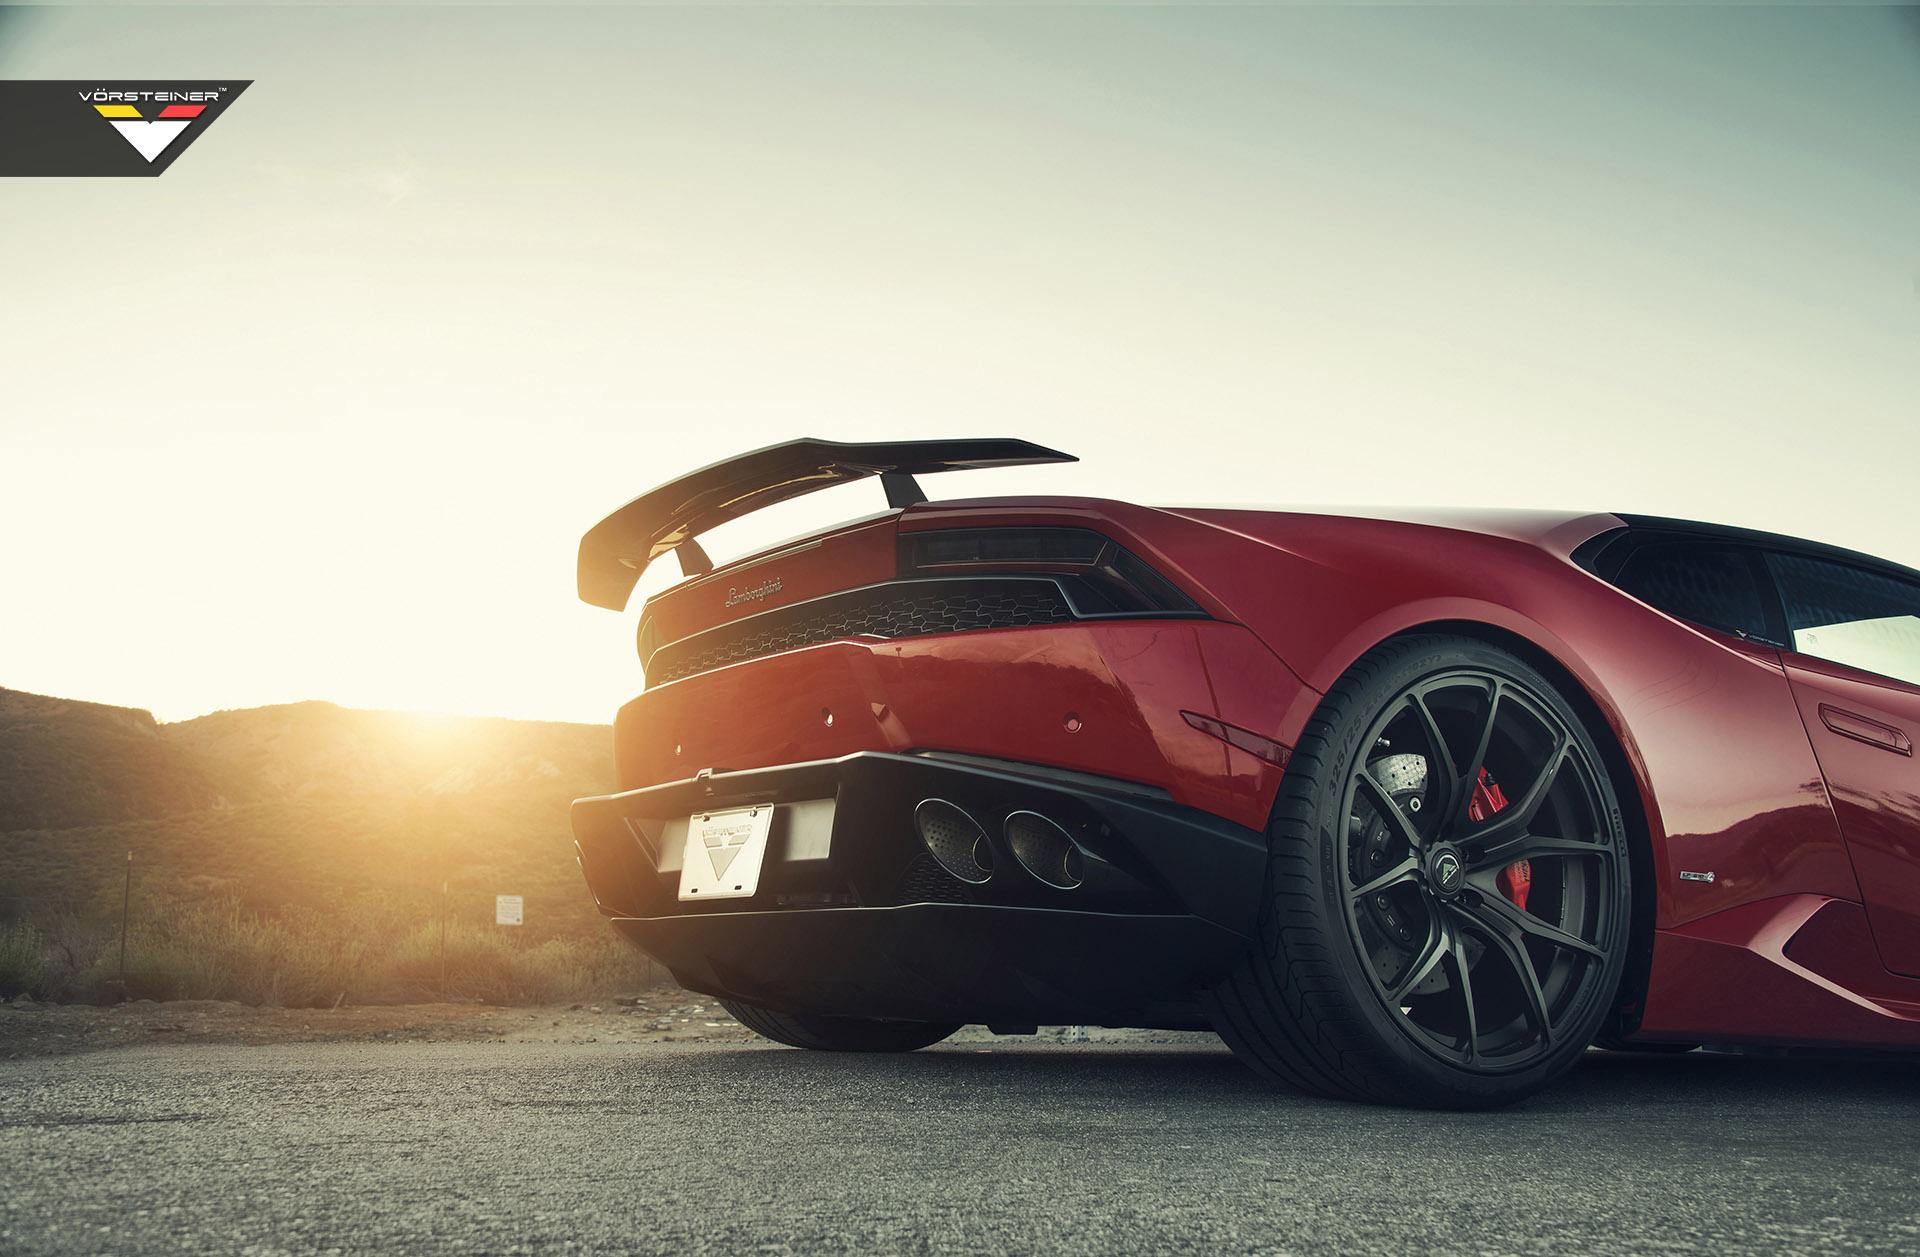 2015-vorsteiner-lamborghini-huracan-verona-edizione-07 Extraordinary Lamborghini Huracan Need for Speed Cars Trend